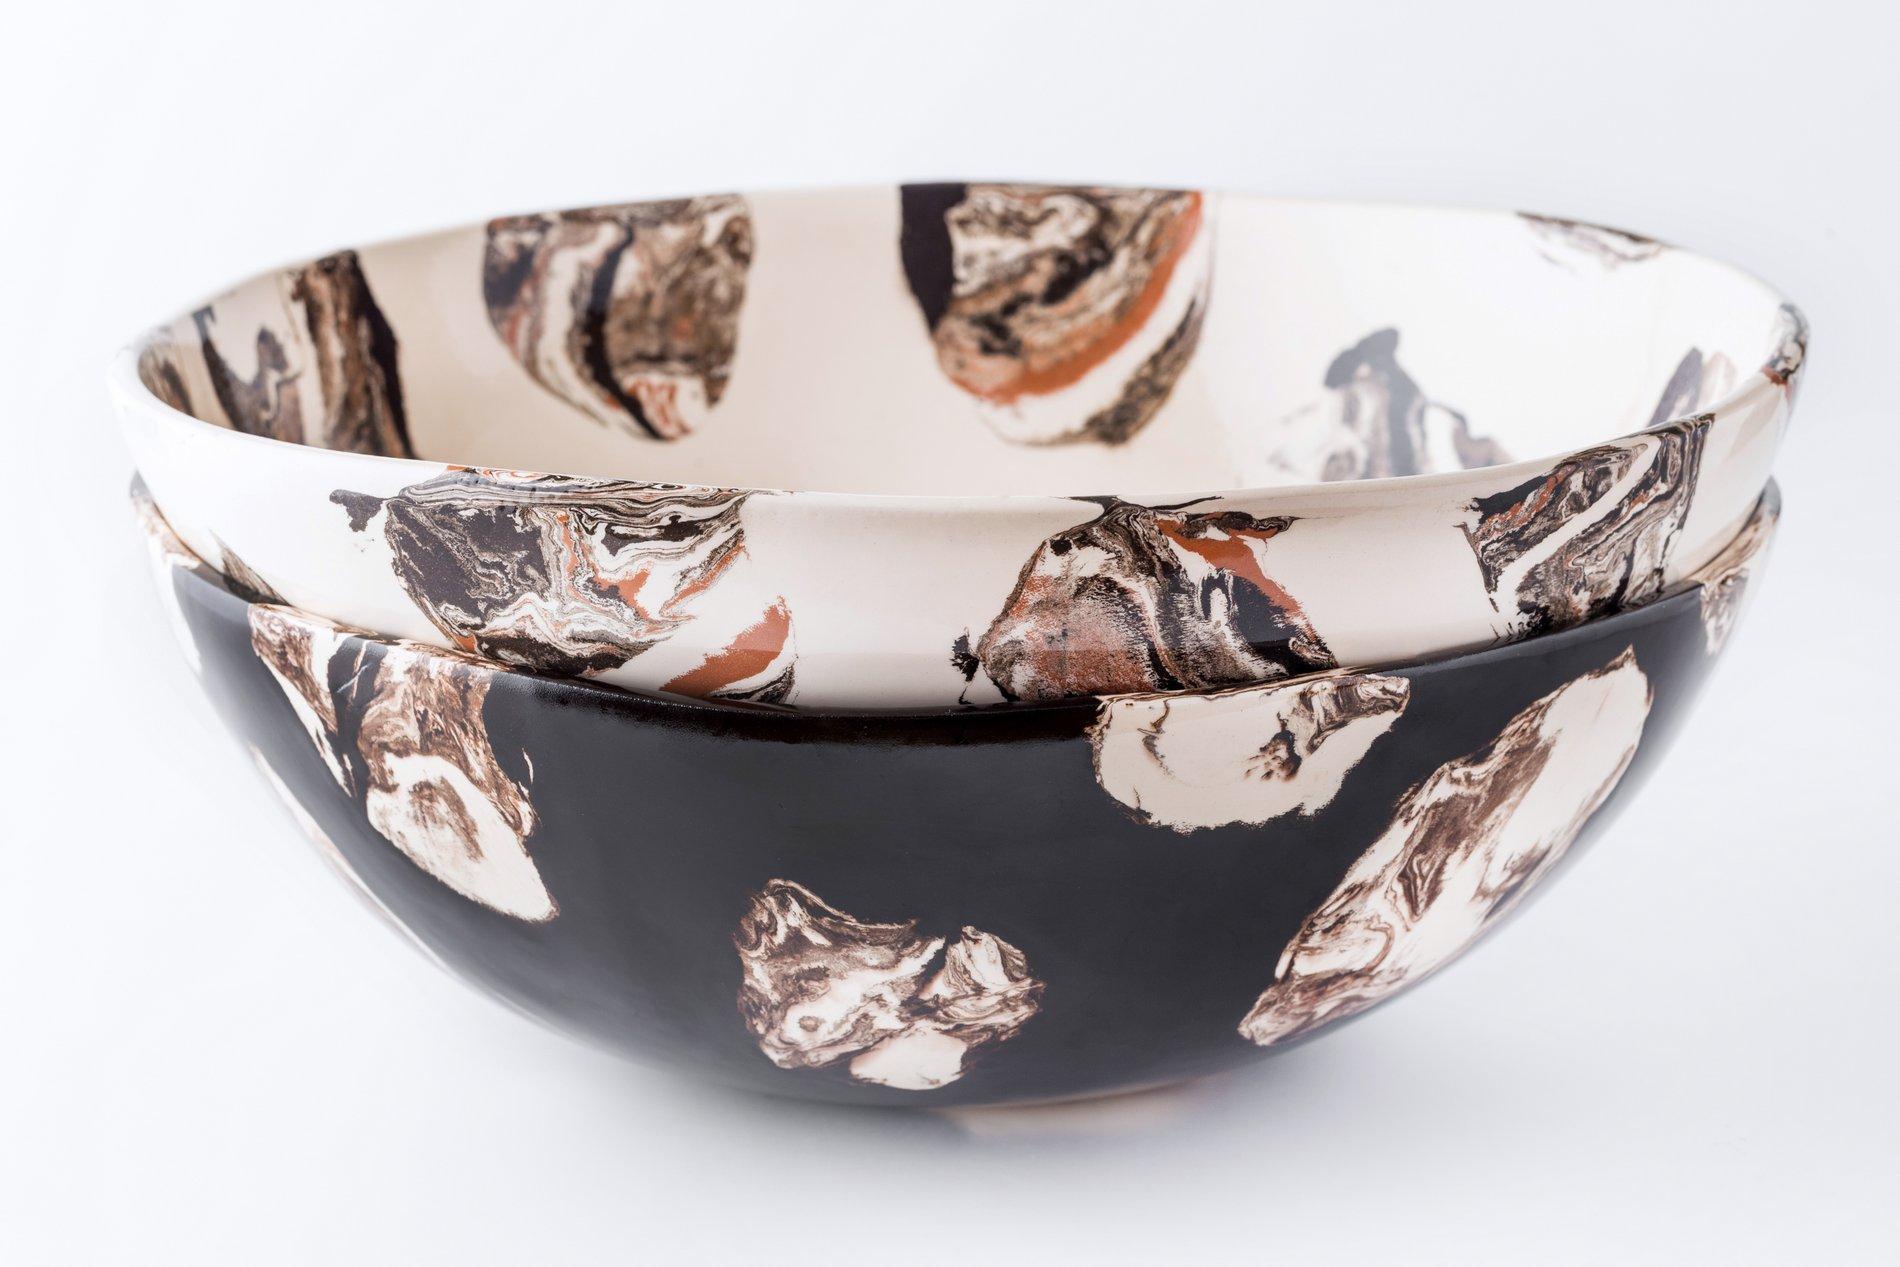 Stone-Bowls-32.jpg